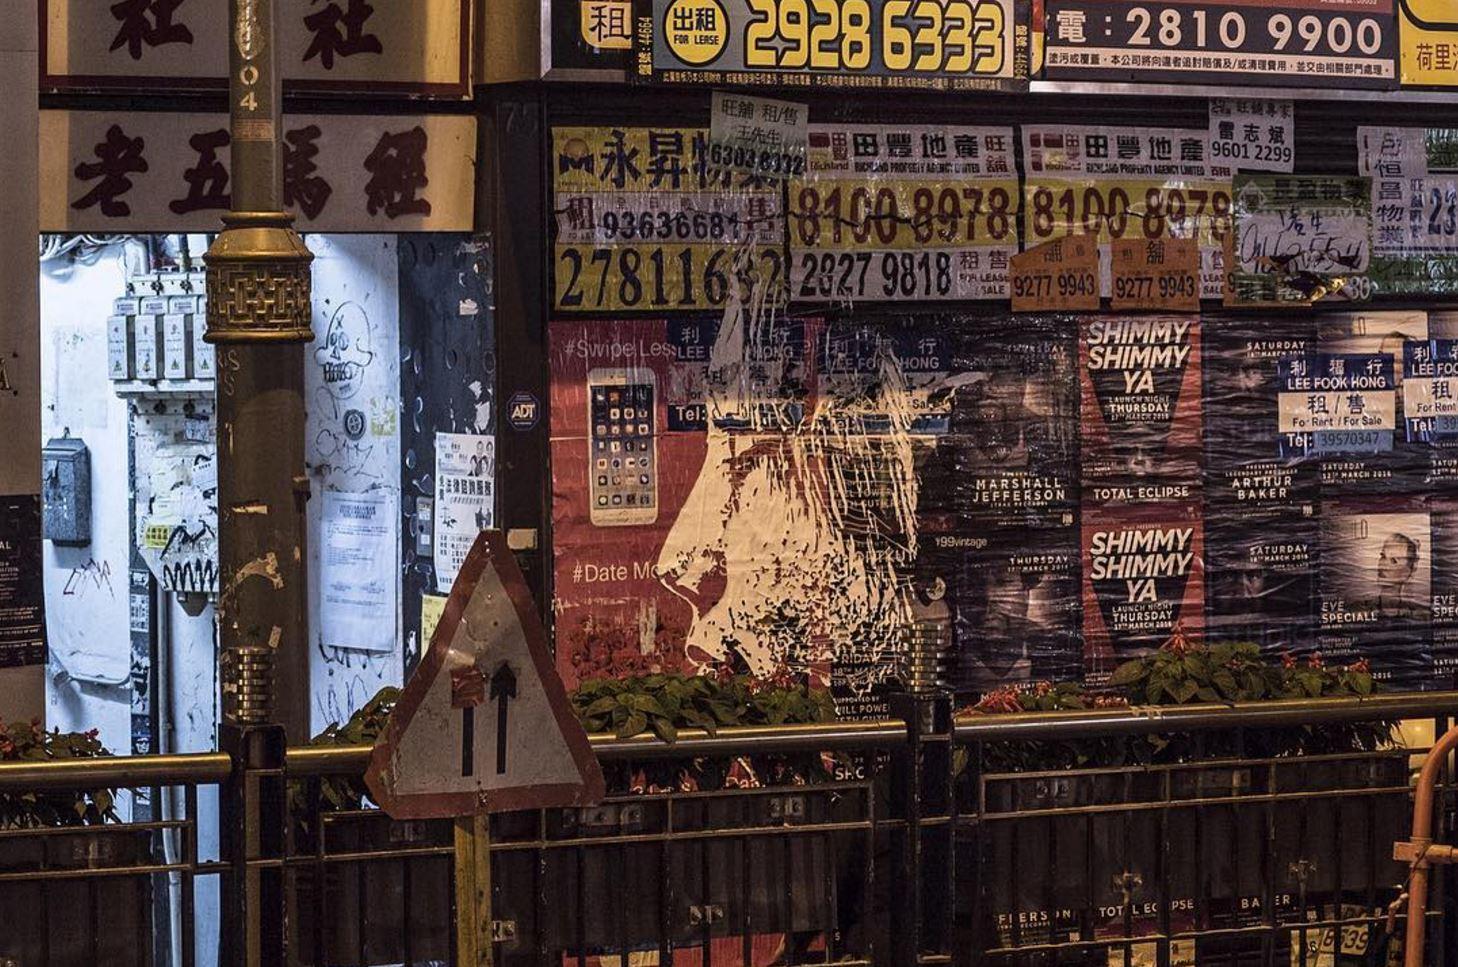 vhils graffiti escutura vandalismo dionisio arte (9)